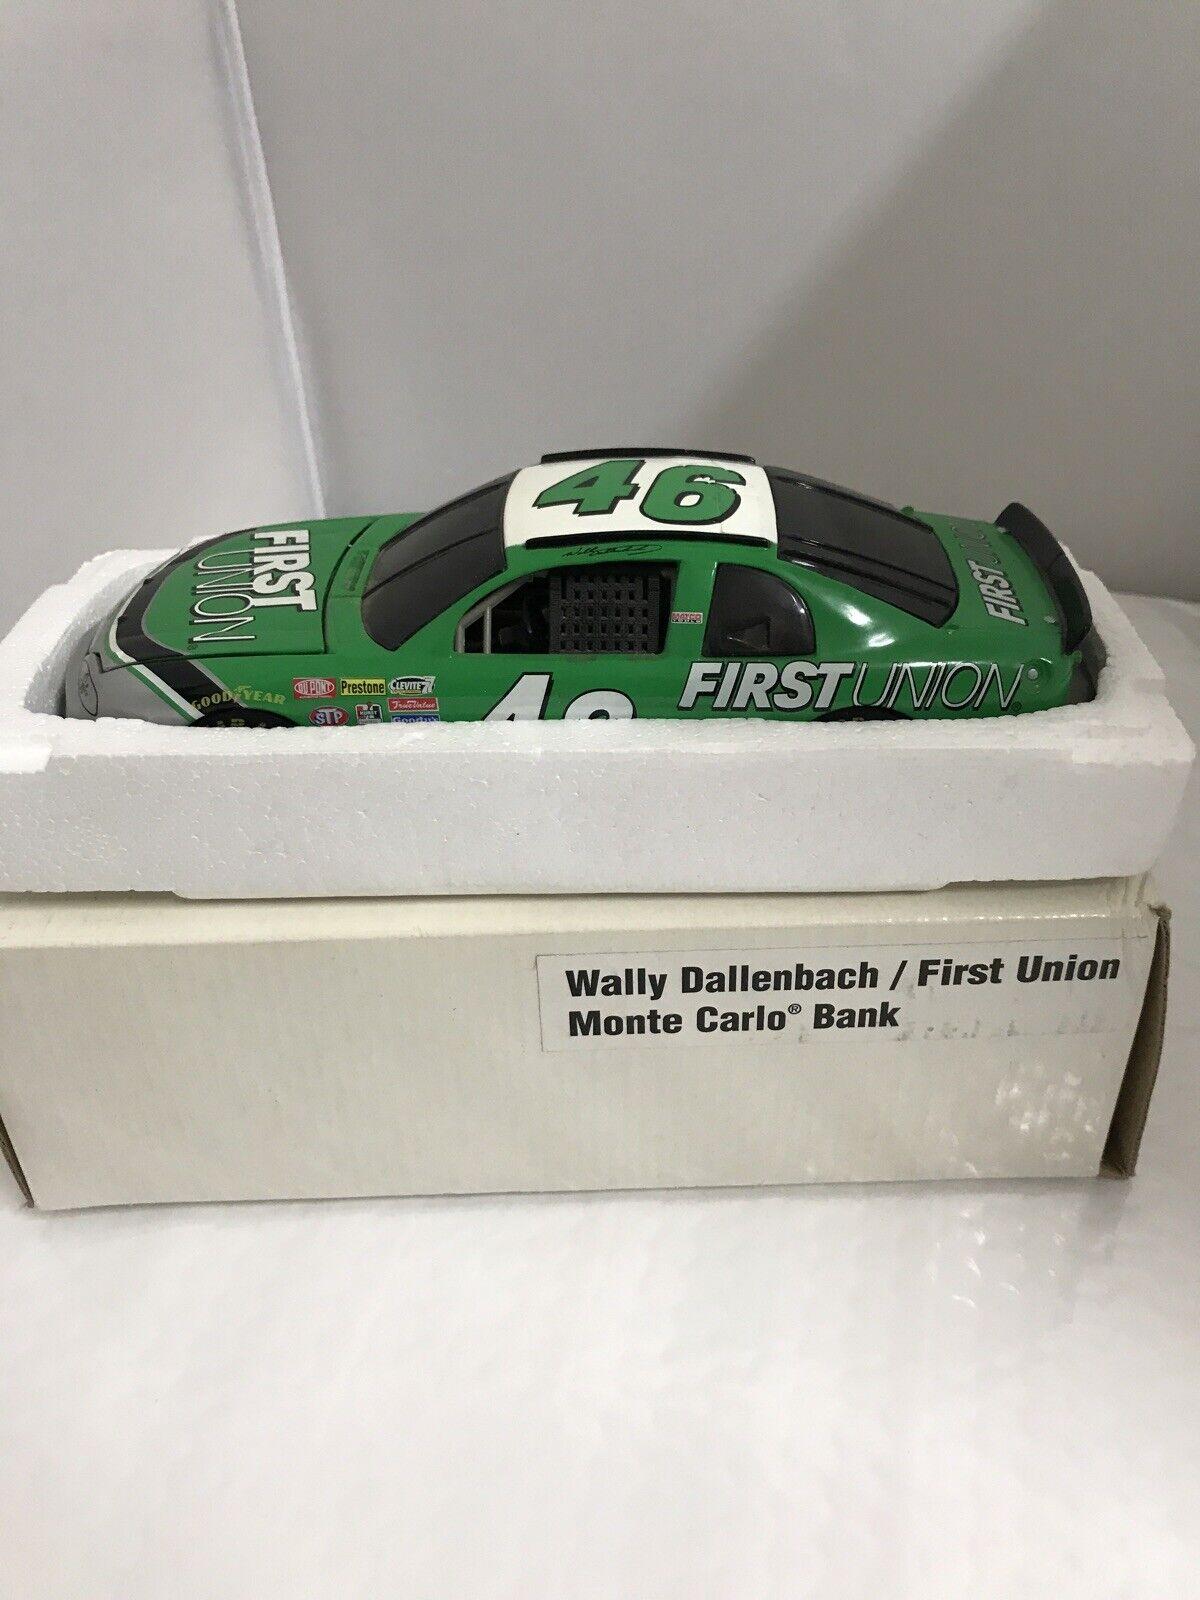 Action Wally Dallenbach 1:24 First Union 1997 Monte Carlo #46 Nascar Diecast Car